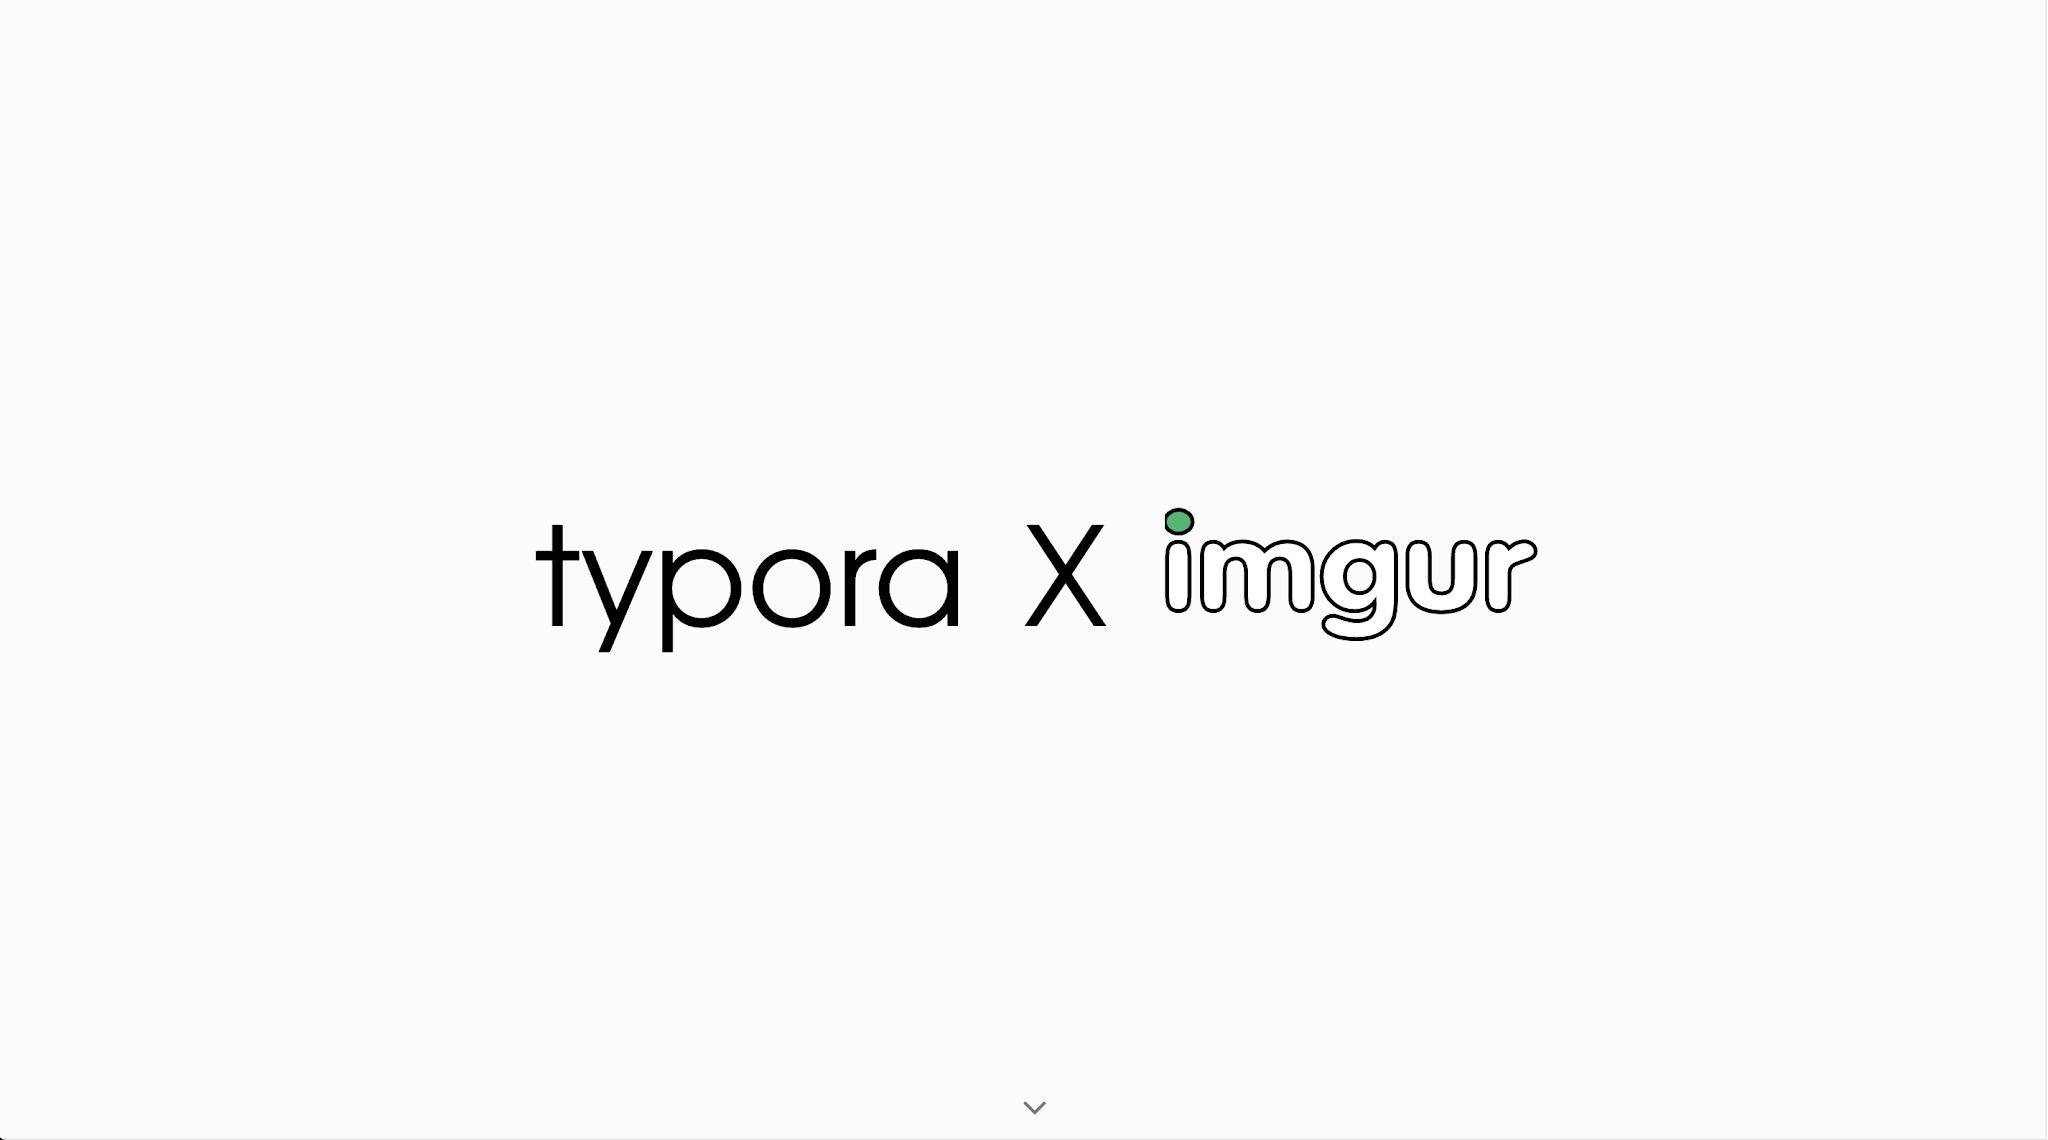 Typora with Imgur